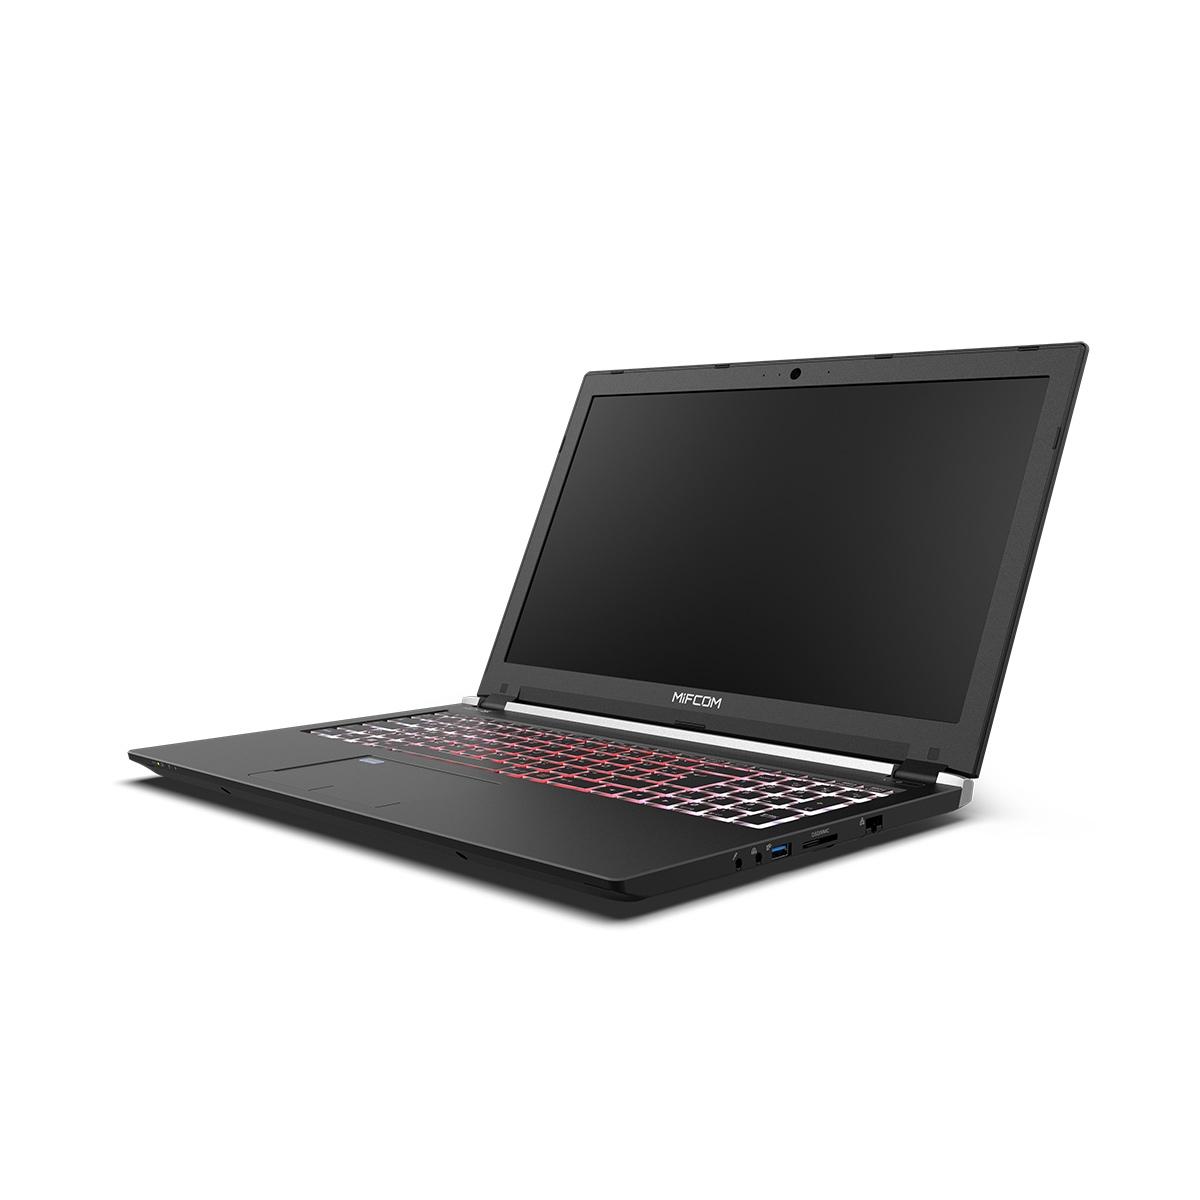 gaming laptop sg6 i7 gtx 1070 premium 15 6 gaming. Black Bedroom Furniture Sets. Home Design Ideas